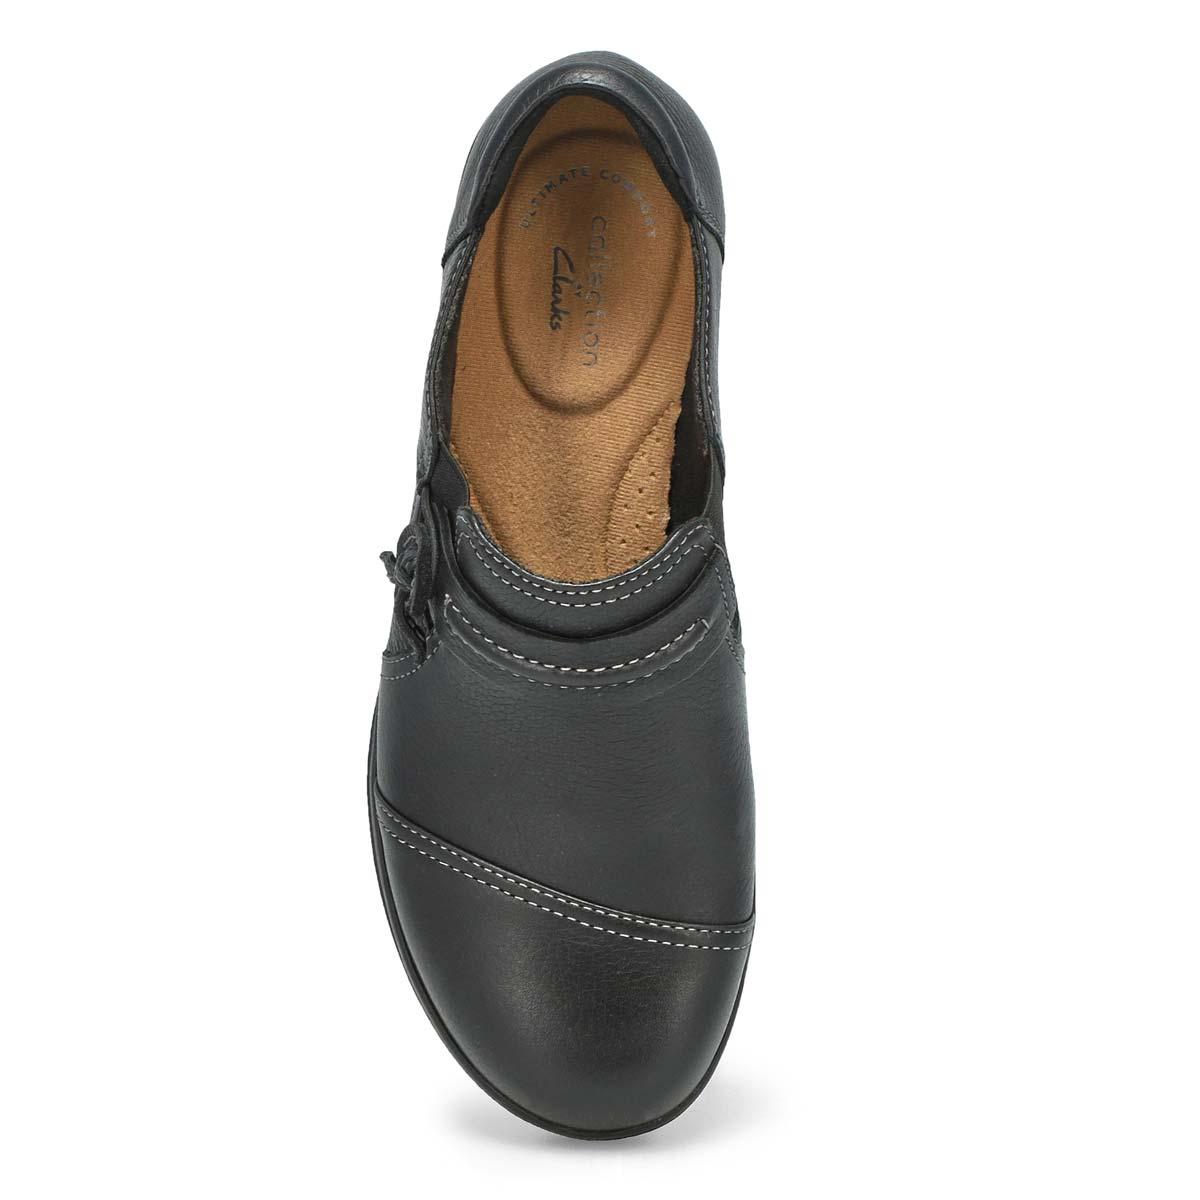 Chaussure à enfiler Cheyn Madi, nr, fem